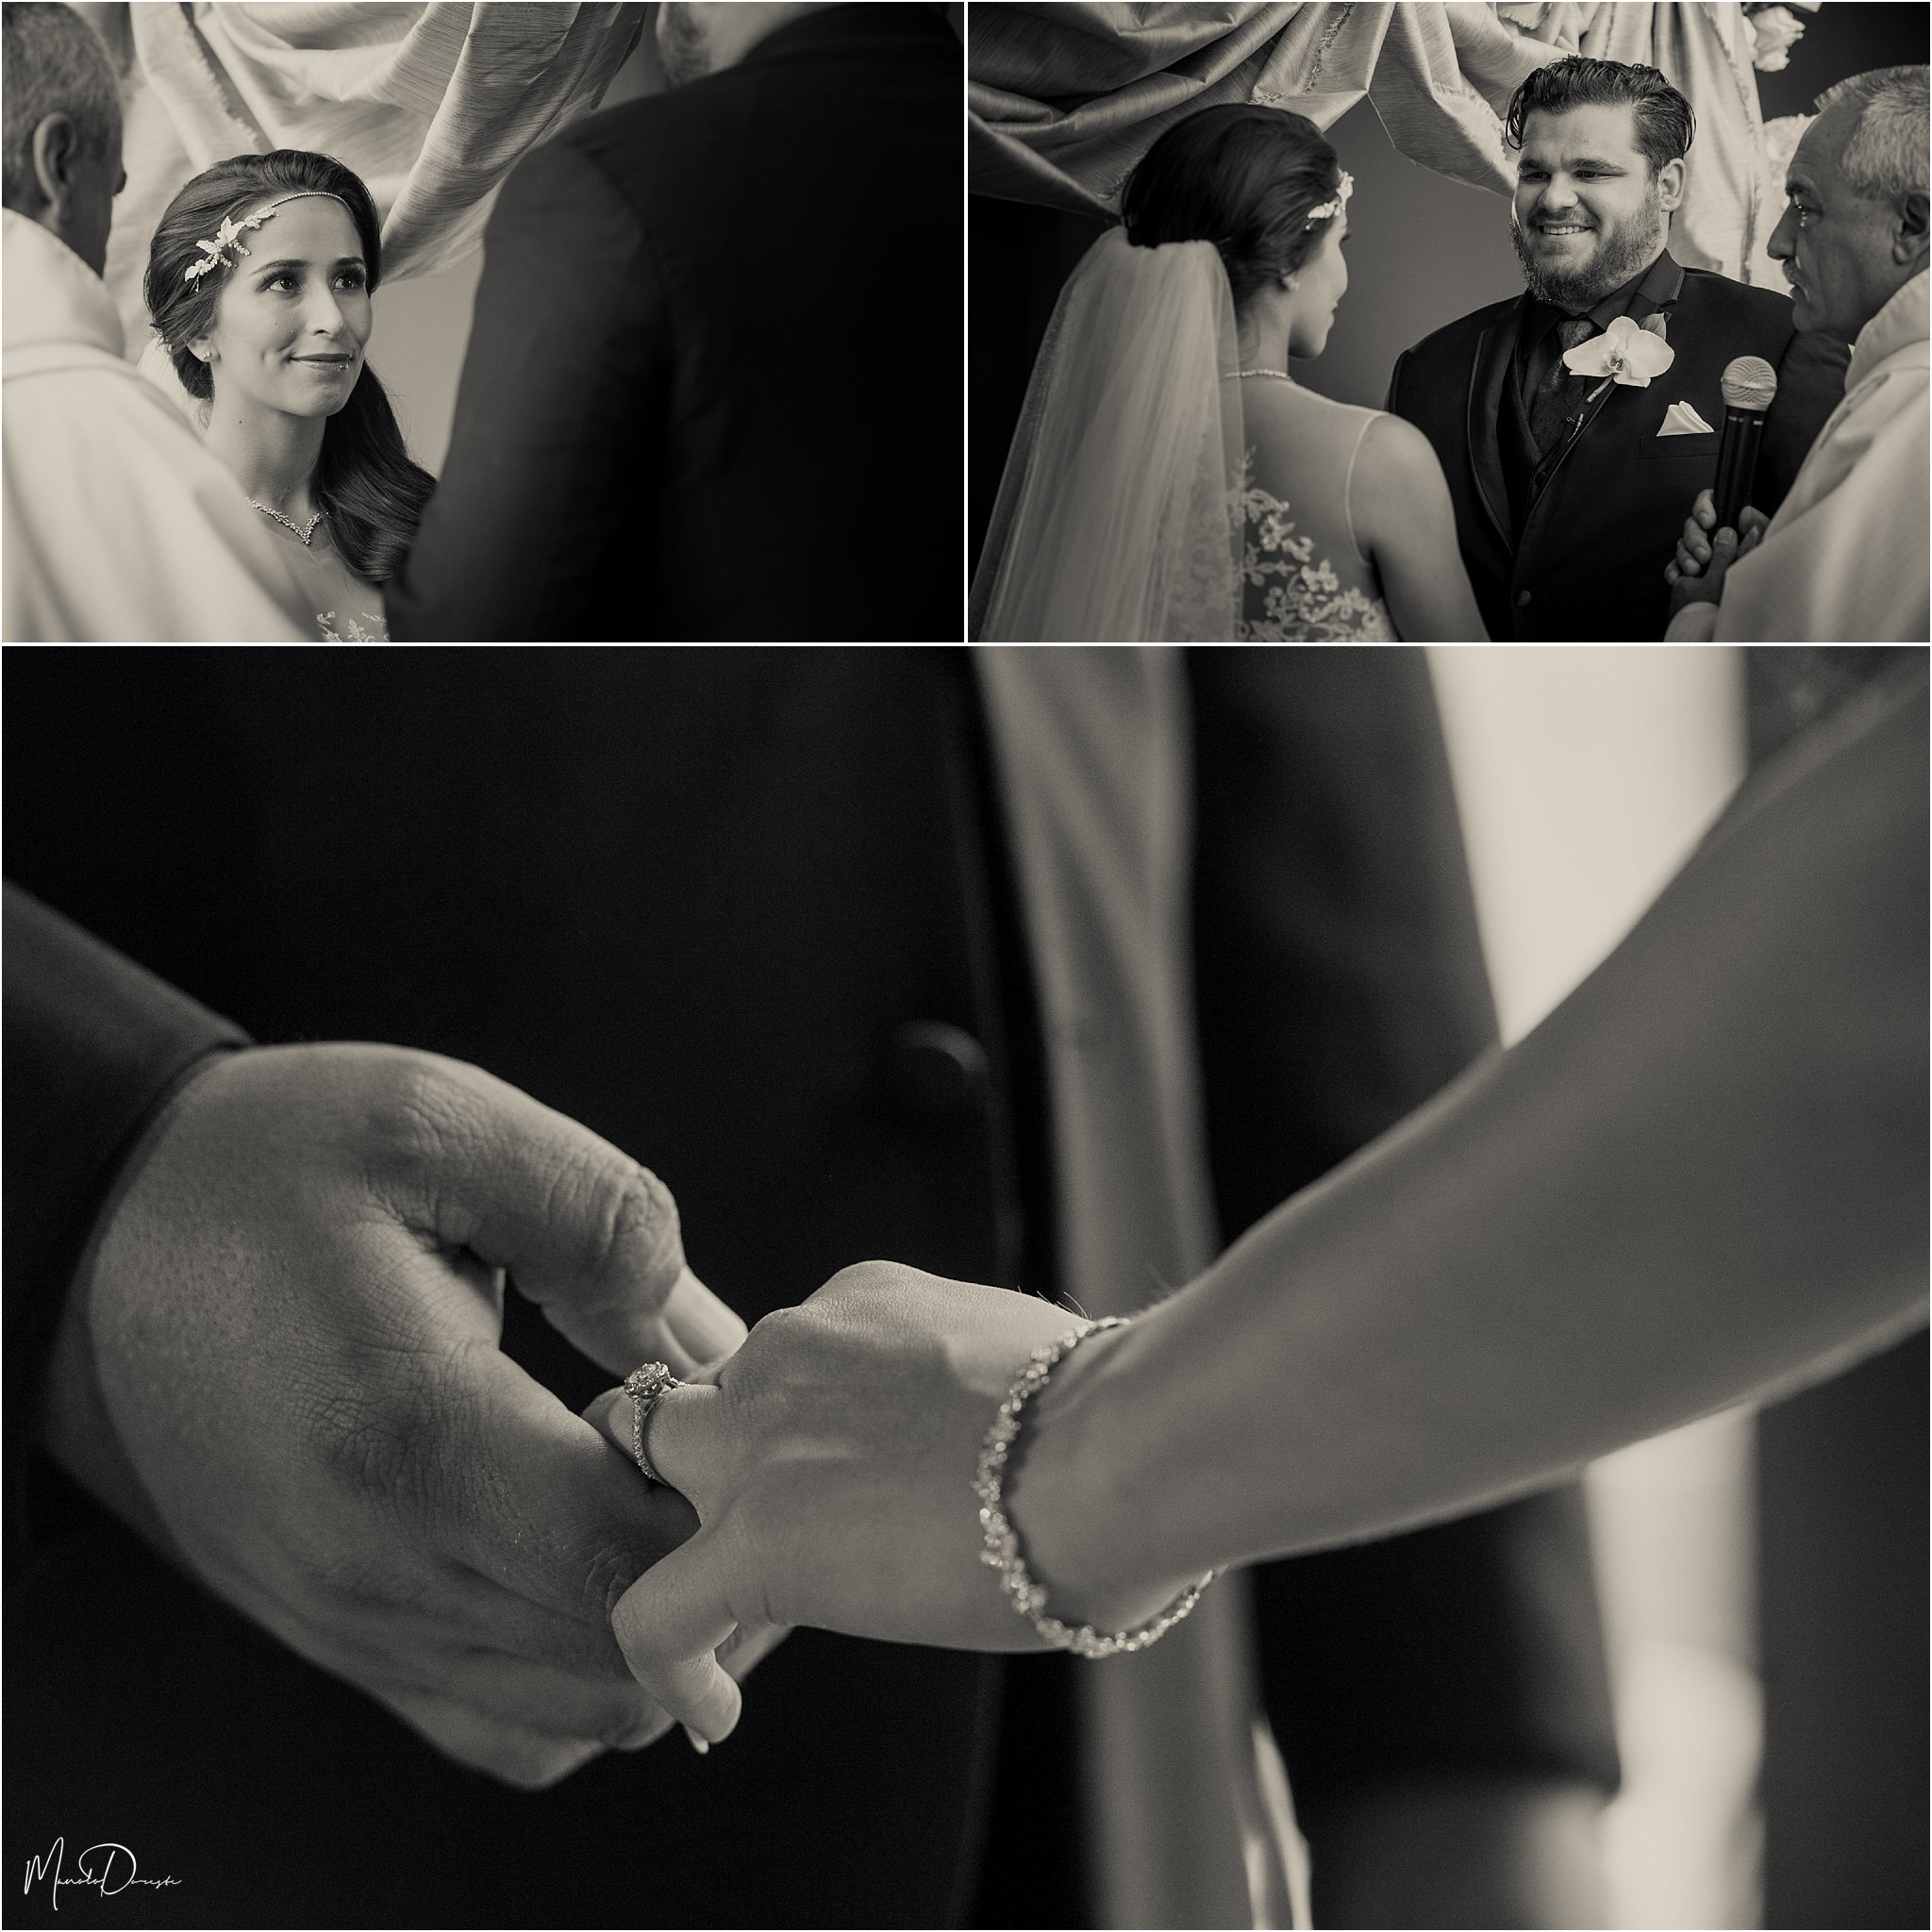 0164_ManoloDoreste_InFocusStudios_Wedding_Family_Photography_Miami_MiamiPhotographer.jpg